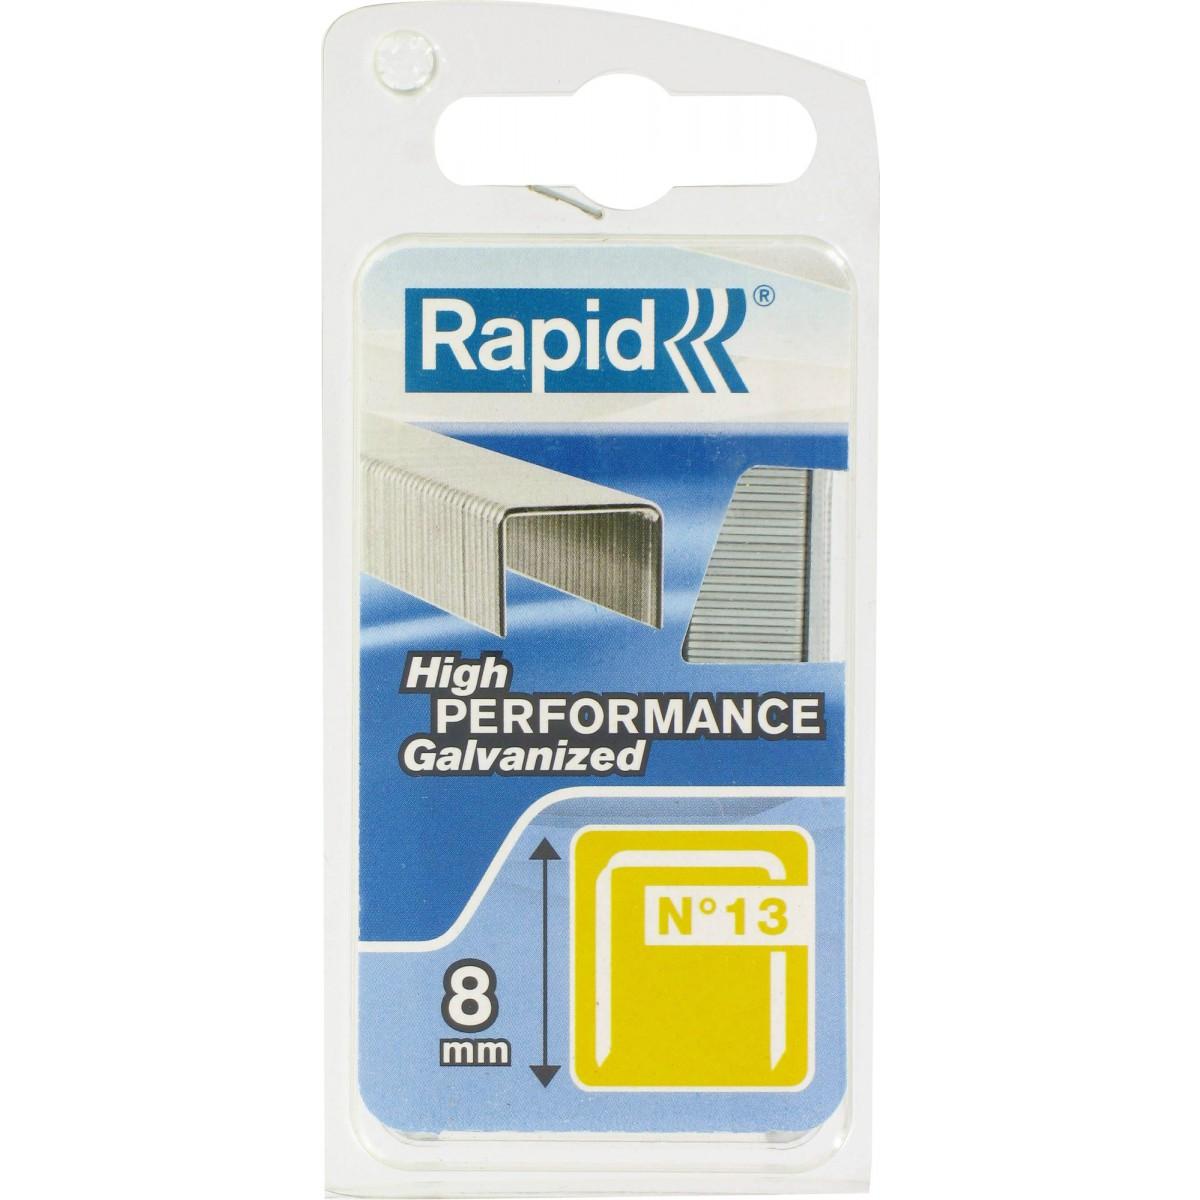 Agrafe n°13 Rapid Agraf - Hauteur 8 mm - 1600 agrafes